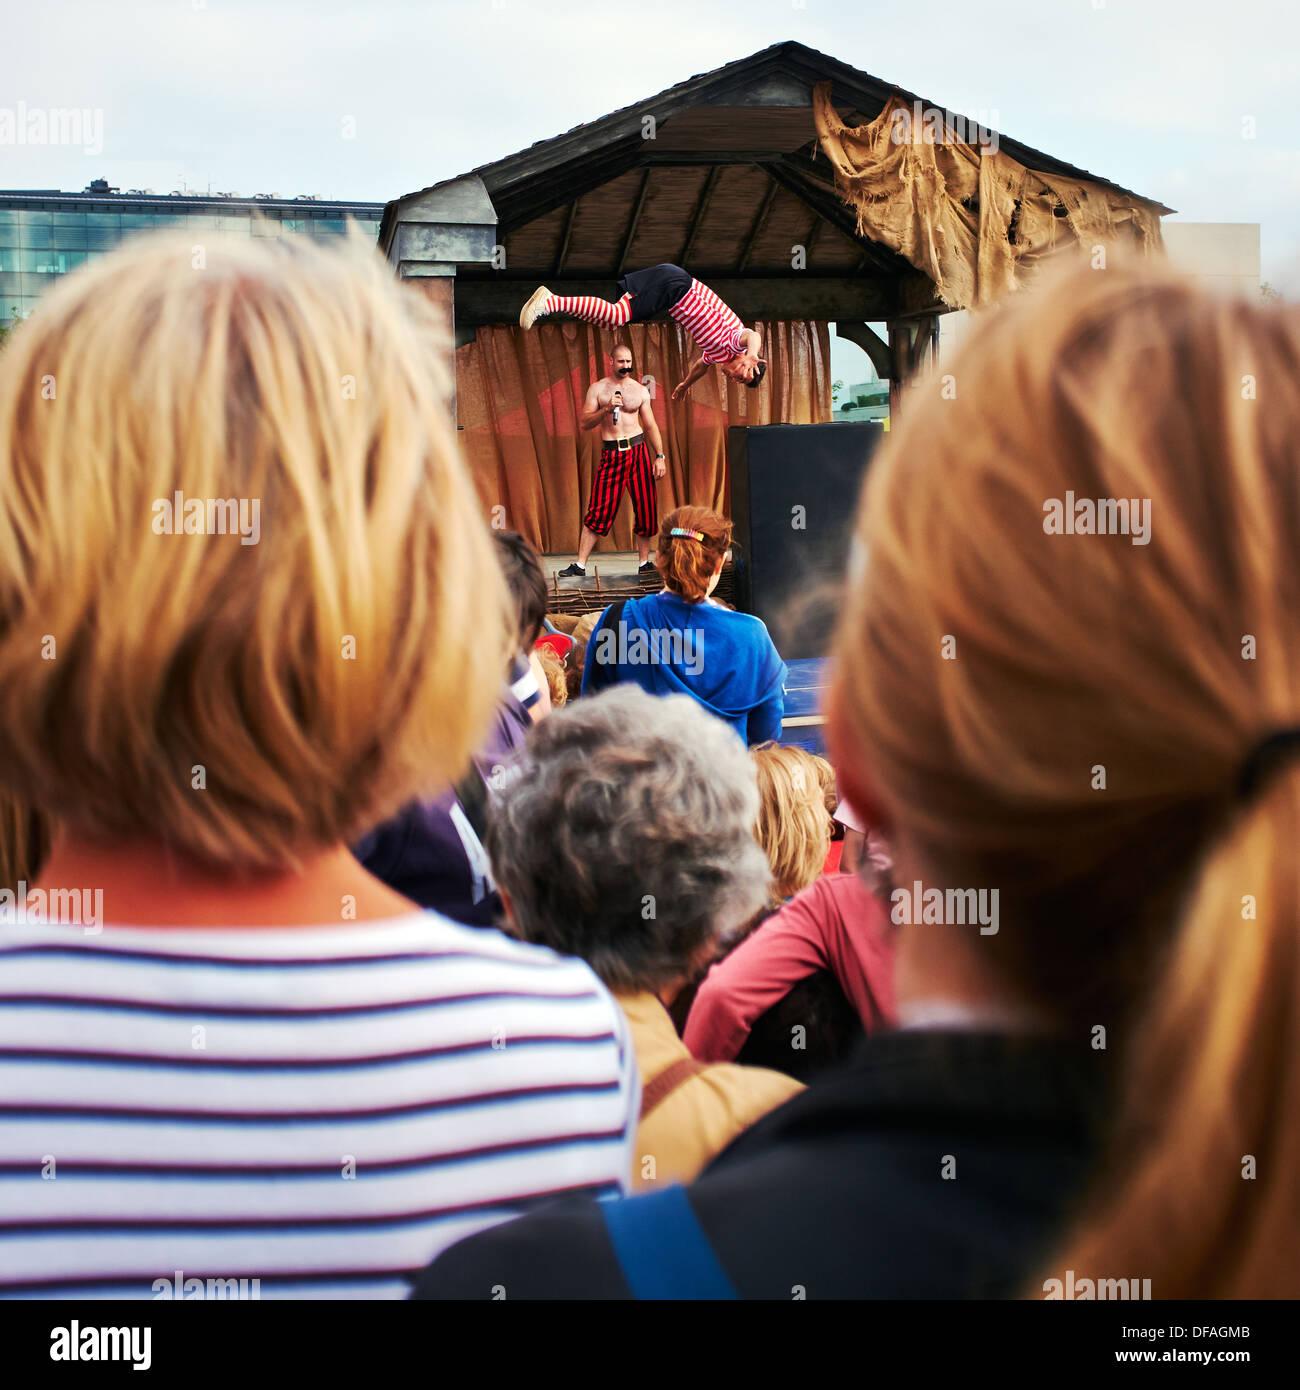 Victorian acrobat show, a scene from King's Cross Journeys, King's Cross, London N1C, 2013. - Stock Image